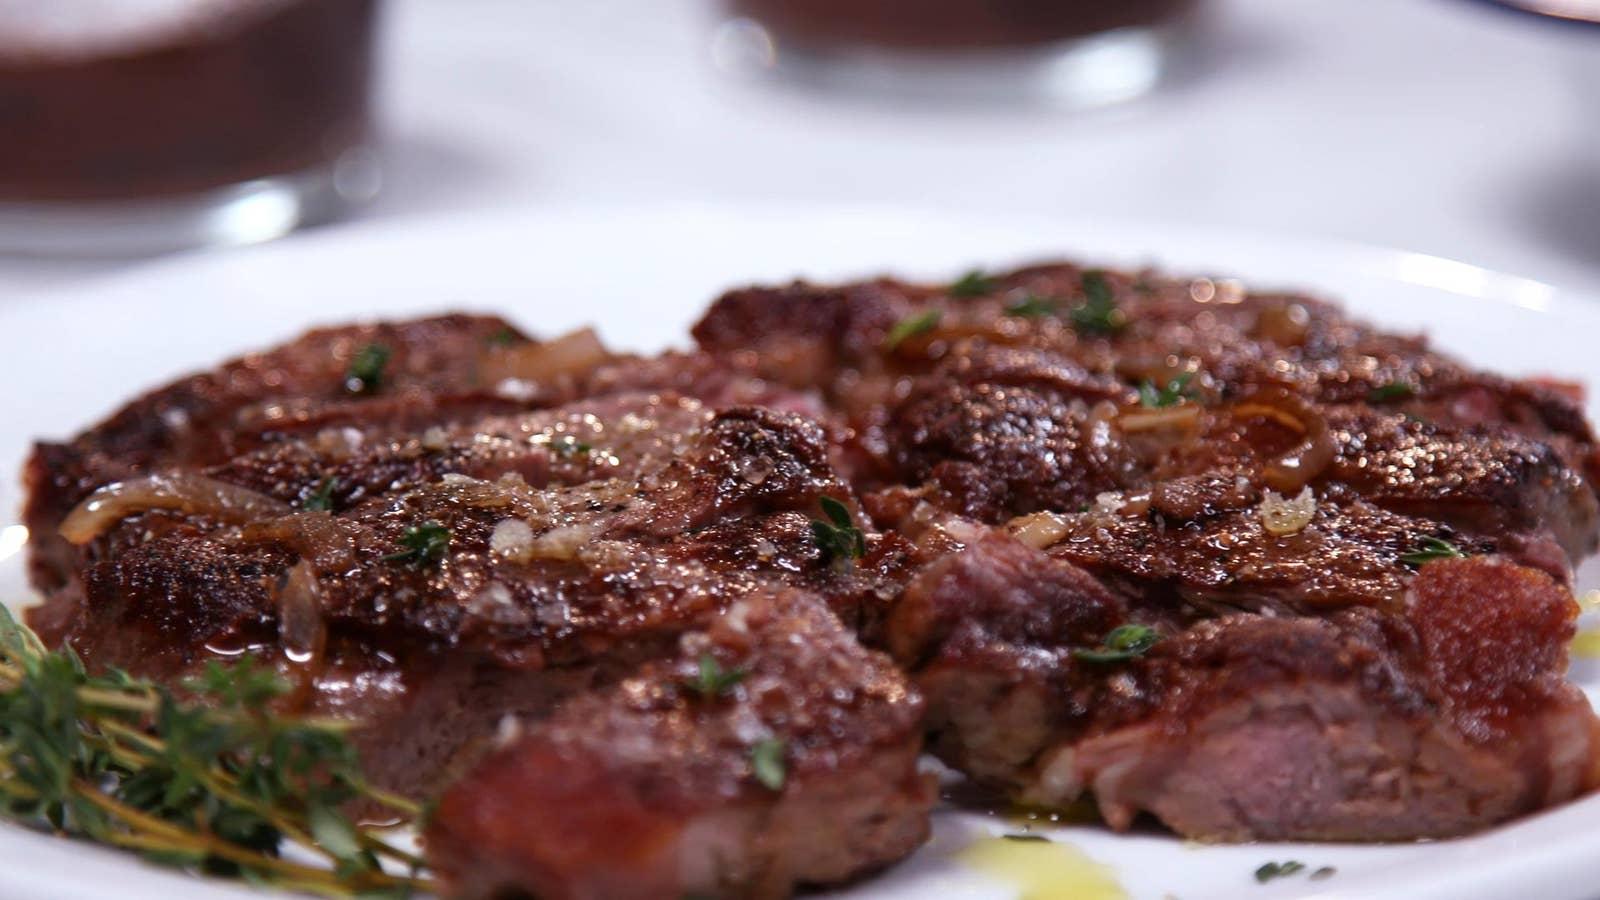 Seared New York Strip Steak